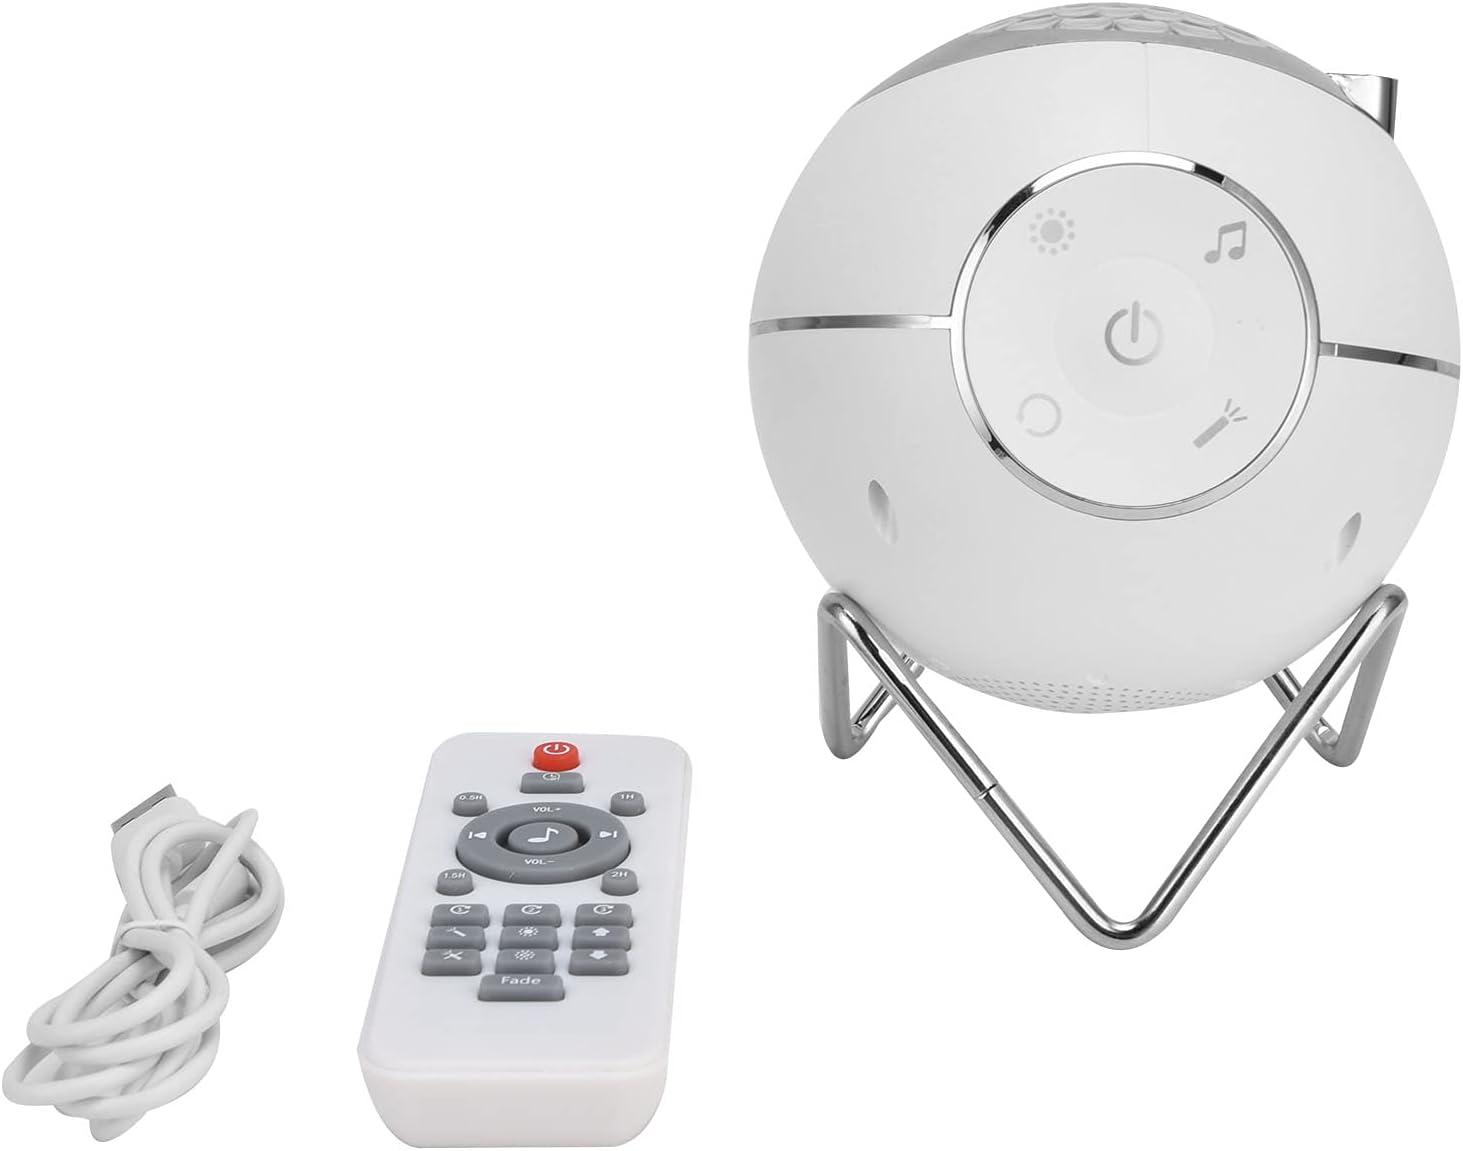 Projector Light 5 Music Accompanying Intelligent C Sleep Max 68% OFF Remote San Jose Mall